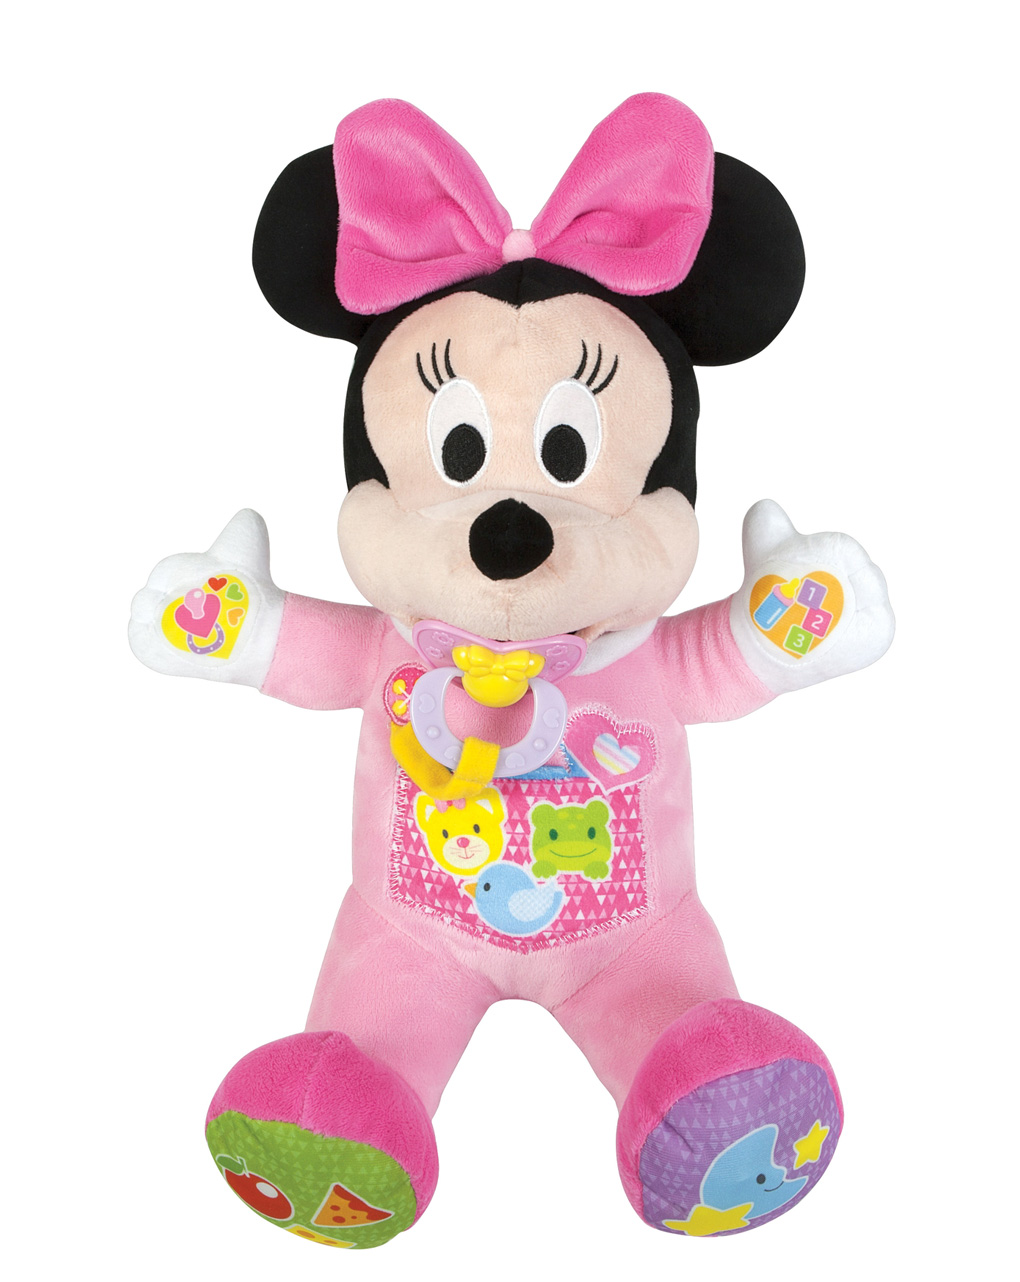 Disney baby - minnie la mia amica bambola - Disney